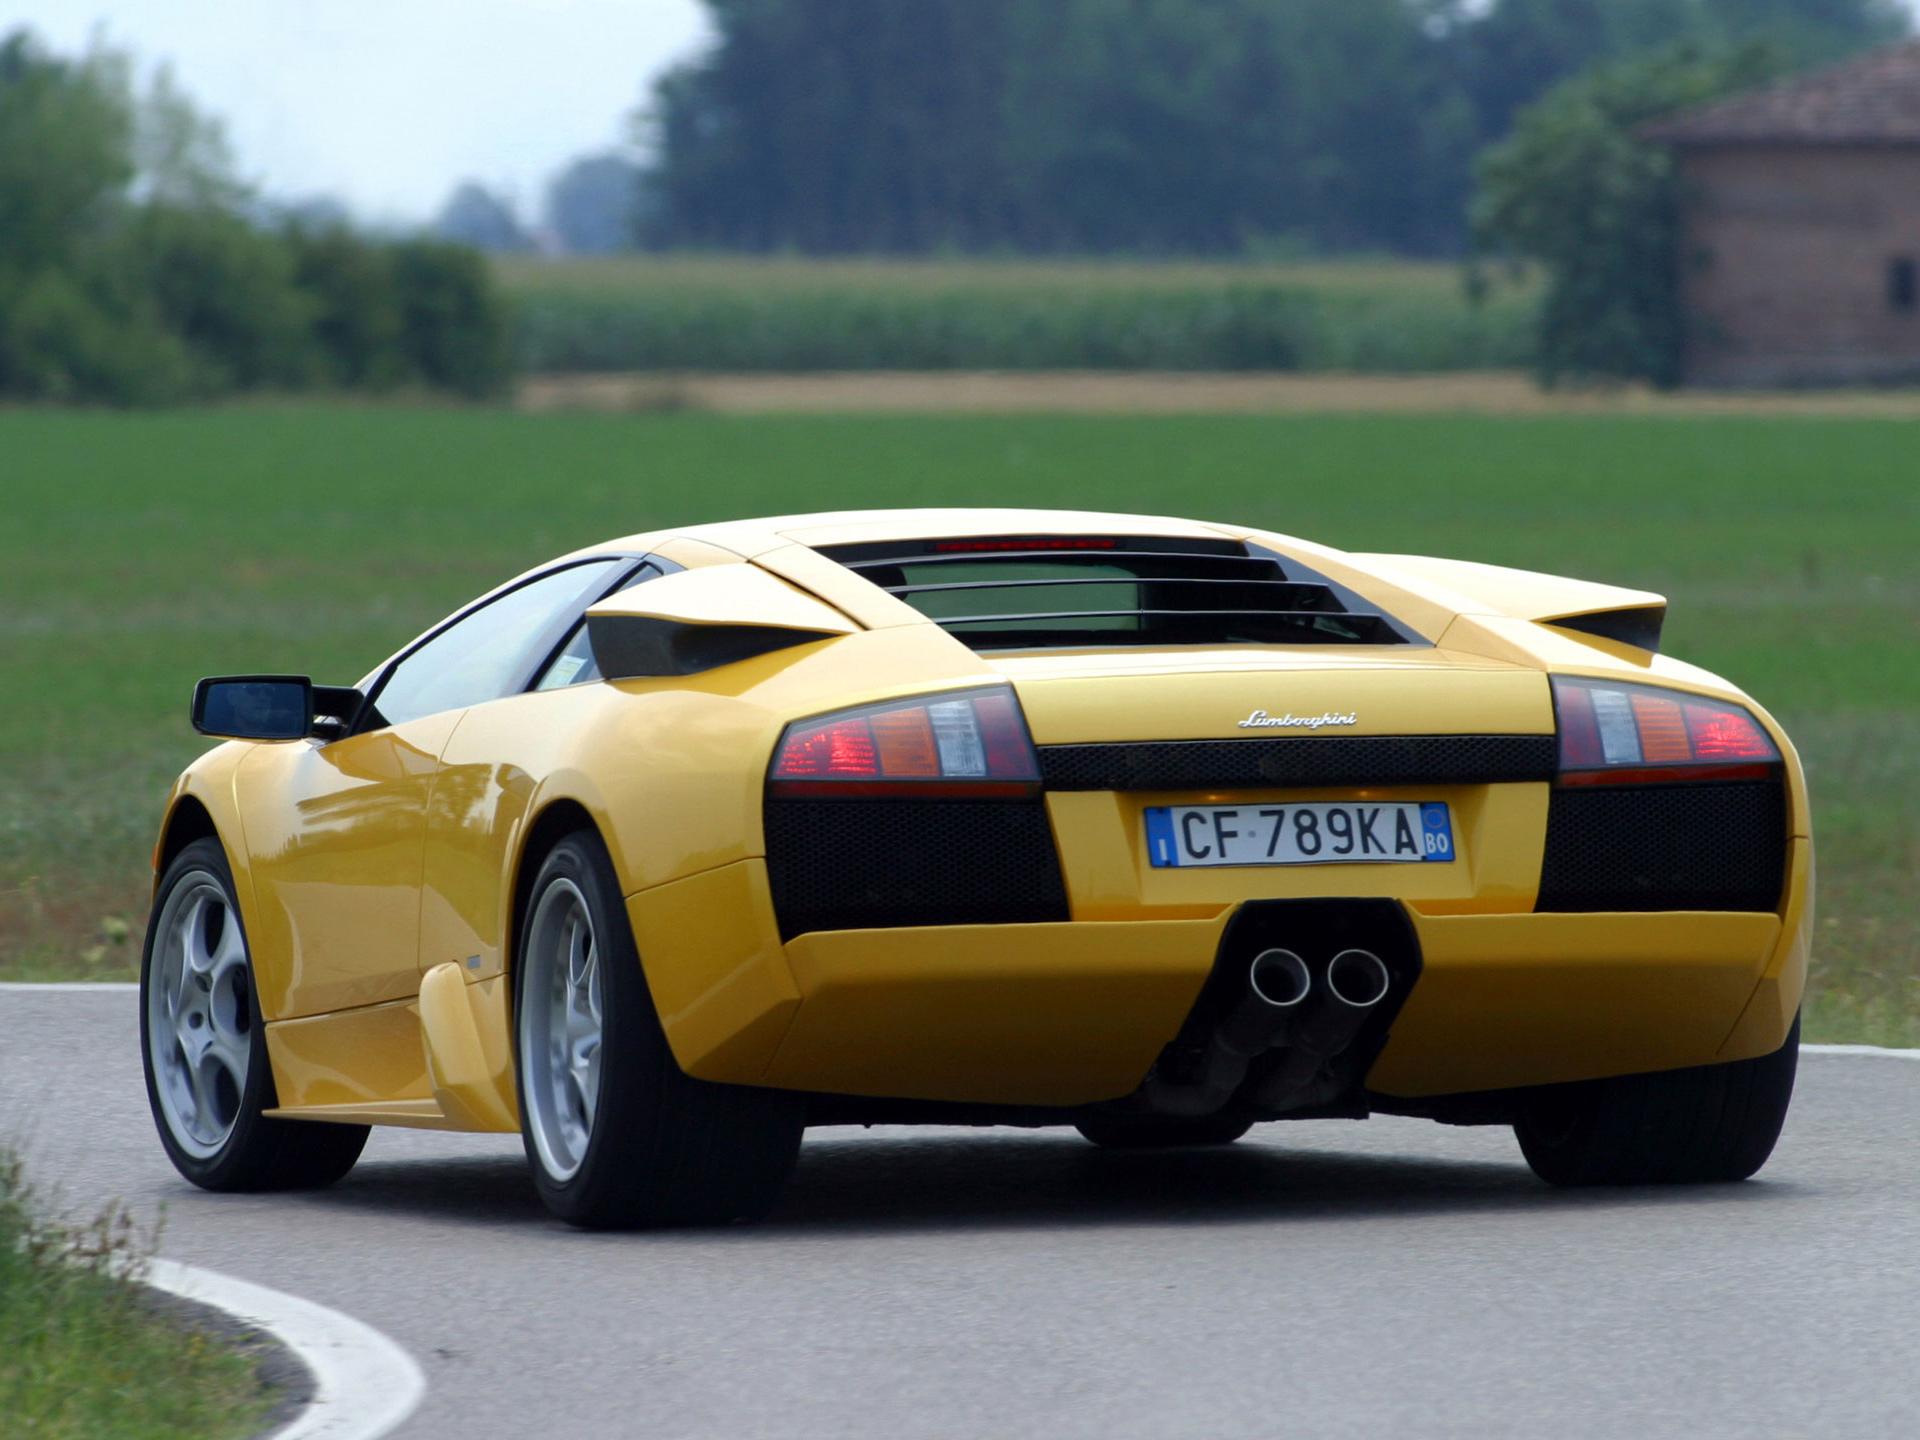 Lamborghini Murcielago (2002-2010)